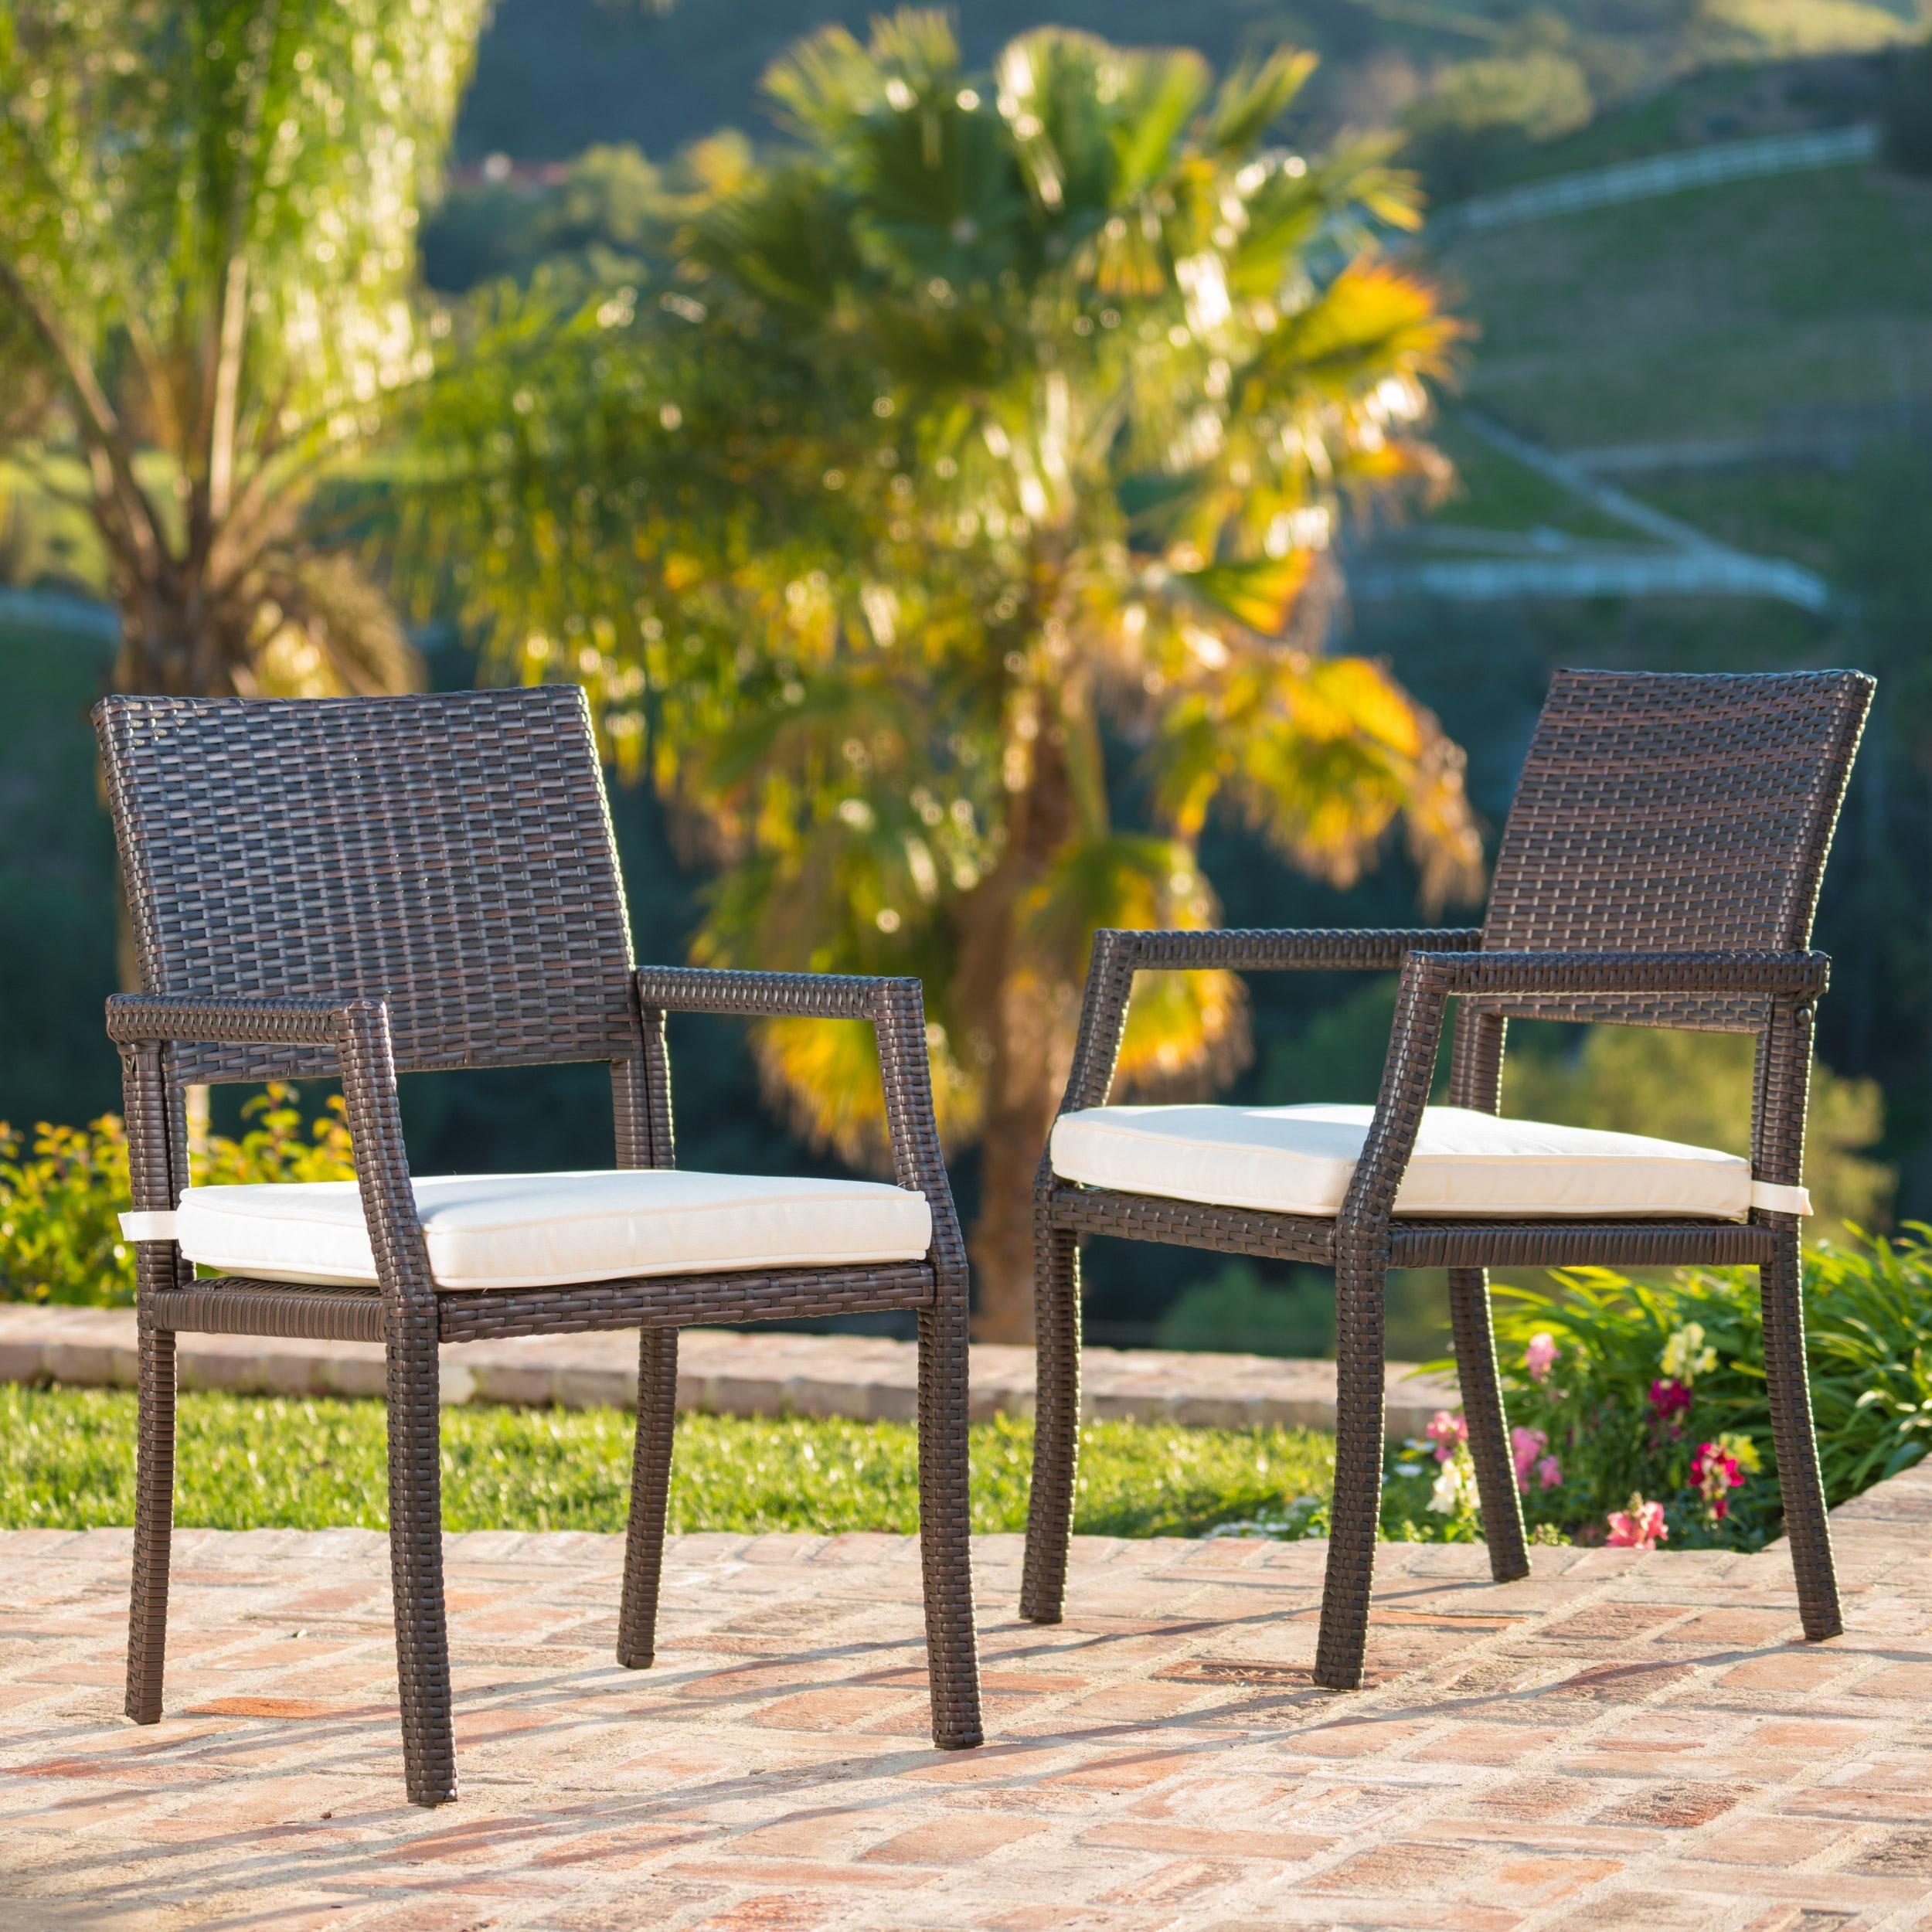 wicker inspirational patio sofa com scheme df jsmorganicsfarm outdoor furniture loveseat new amazing porch